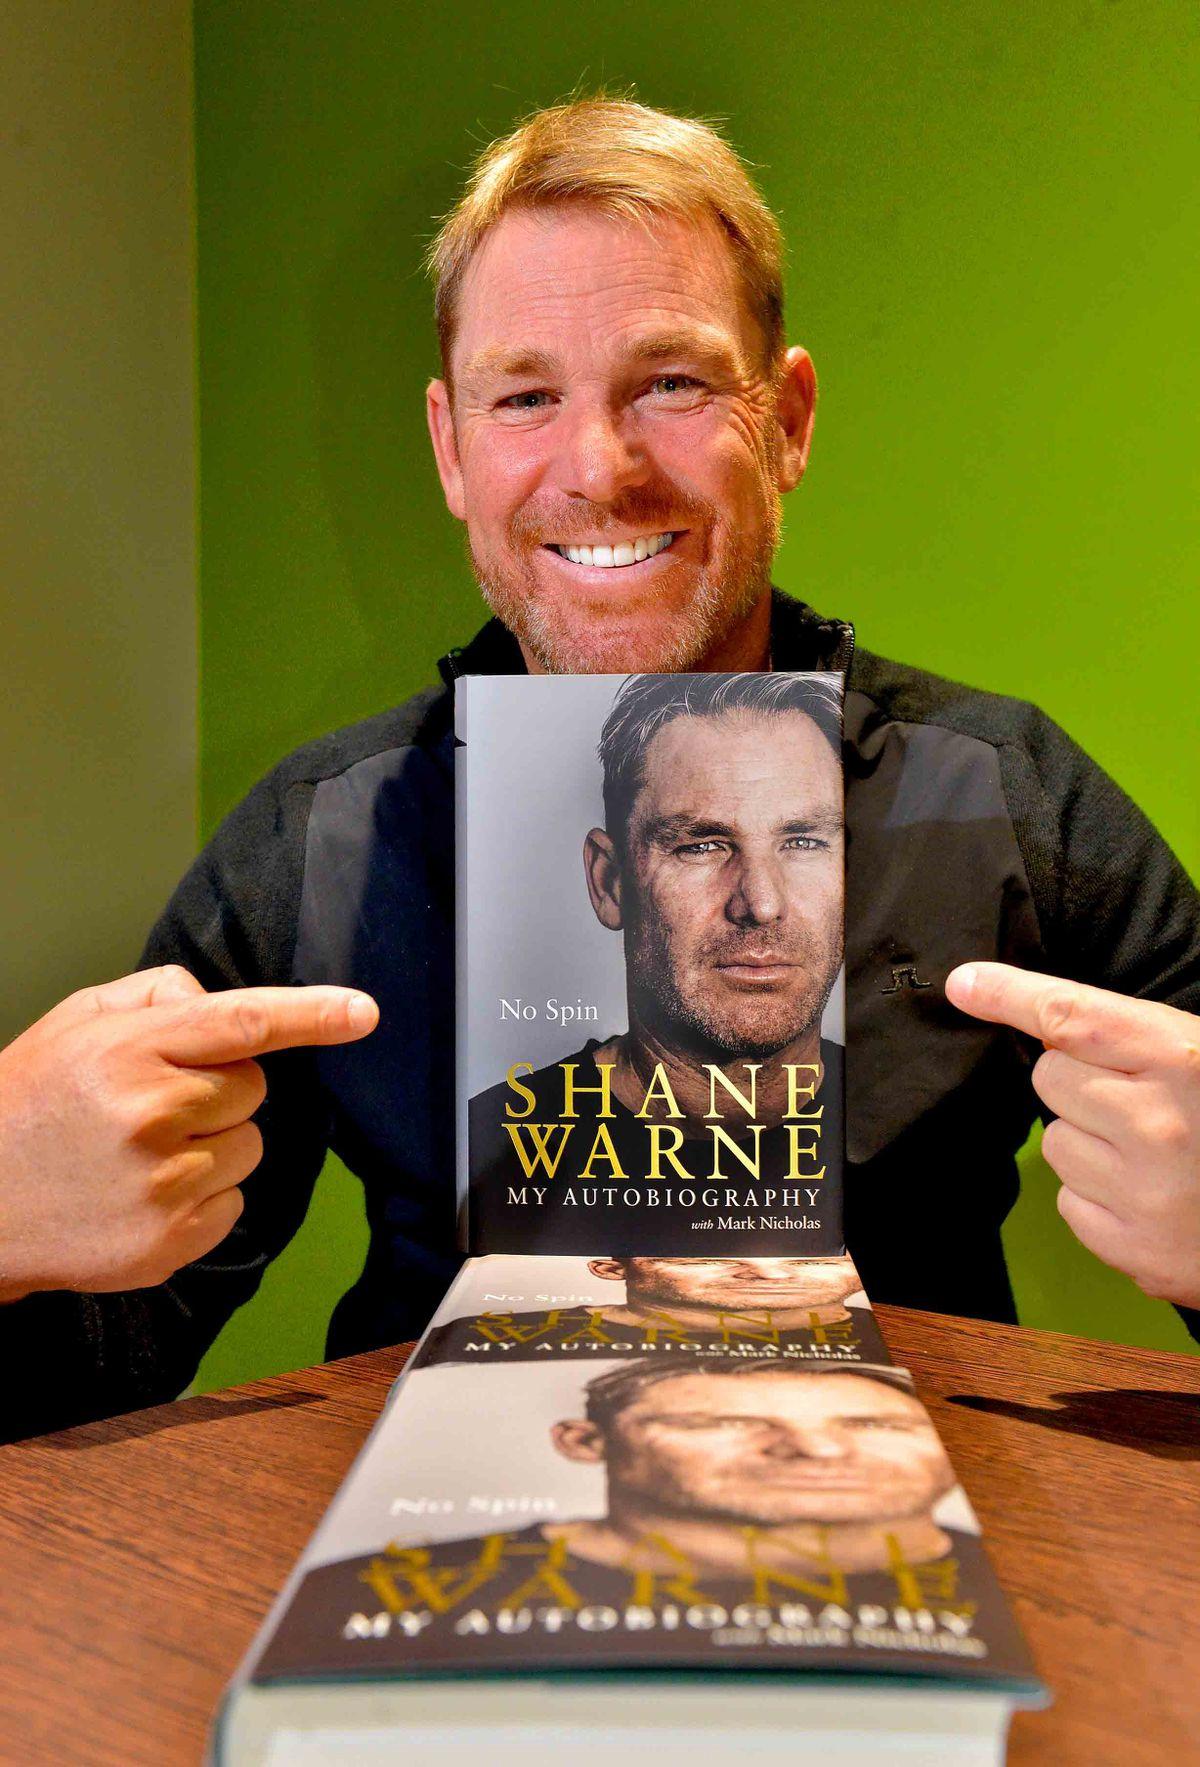 Shane Warne in Shropshire